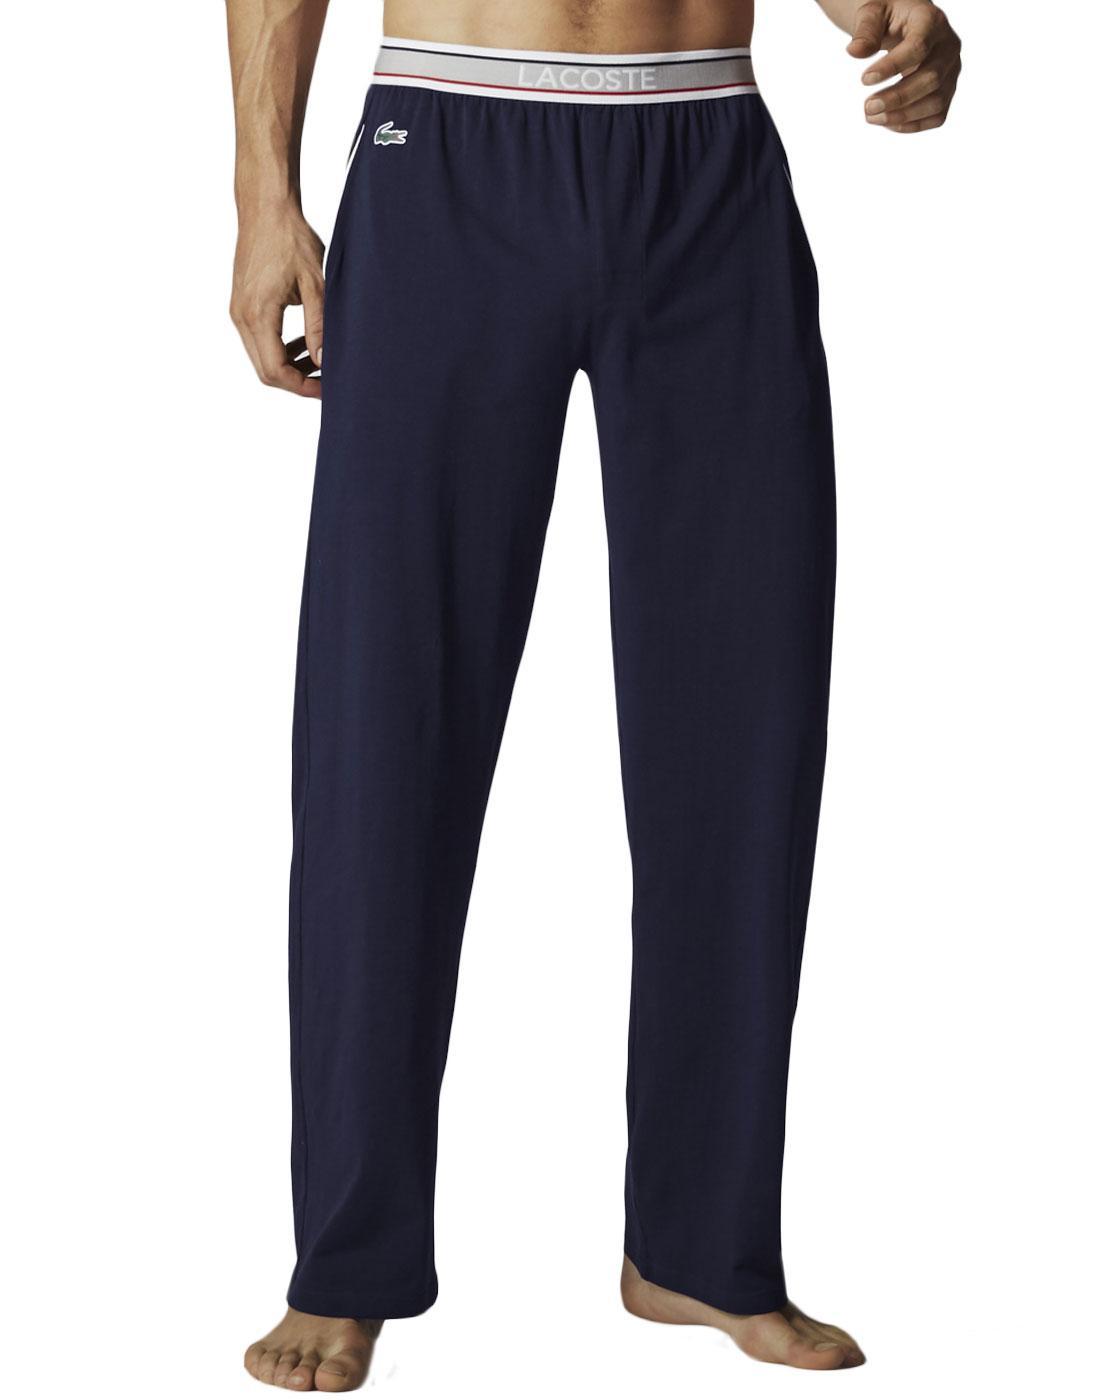 + LACOSTE Retro Stripe Waistband Long Lounge Pants